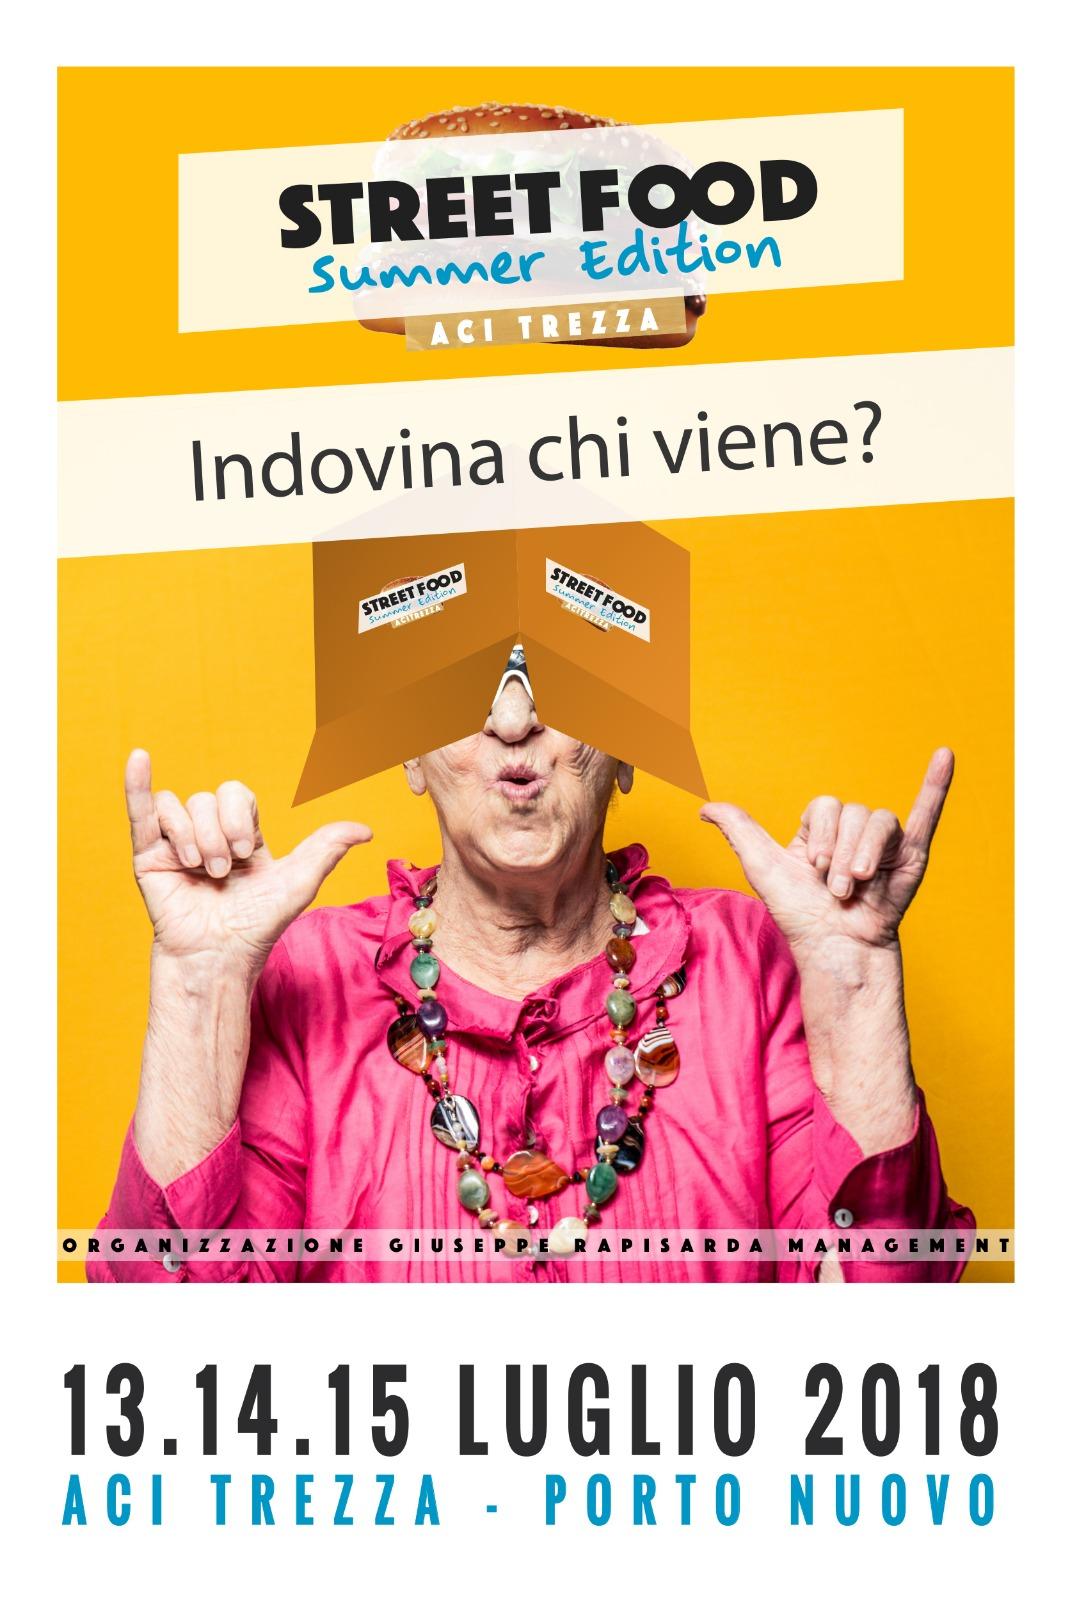 Ad Aci Trezza lo Street Food Summer Edition: dal 13 al 15 luglio